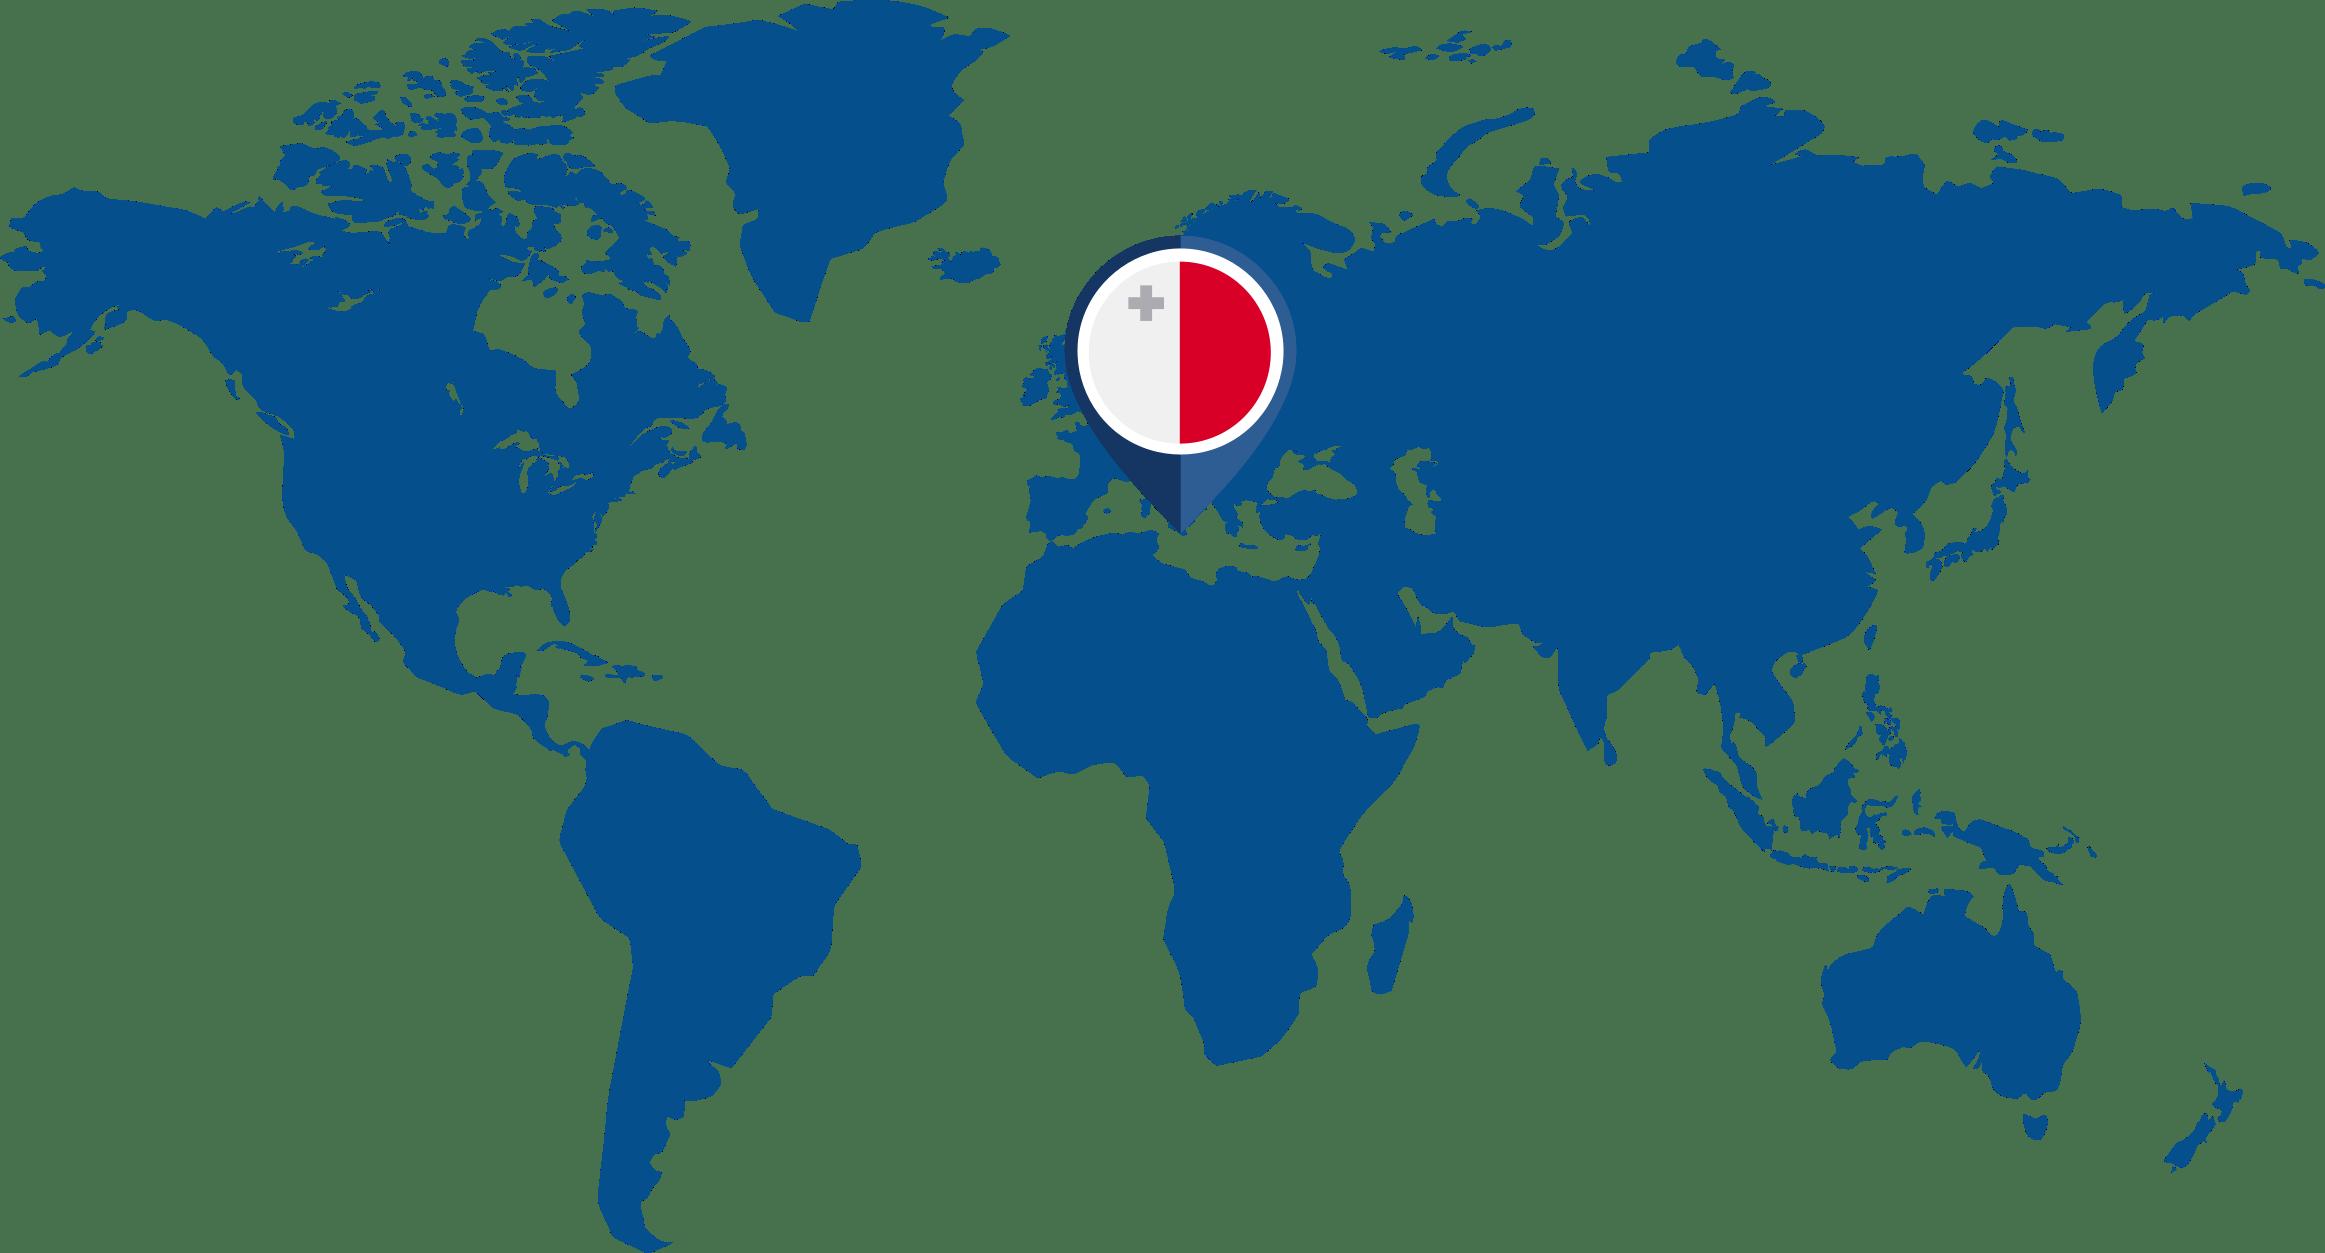 https://www.bluemina.com/wp-content/uploads/2020/02/Malta-Location-1.png